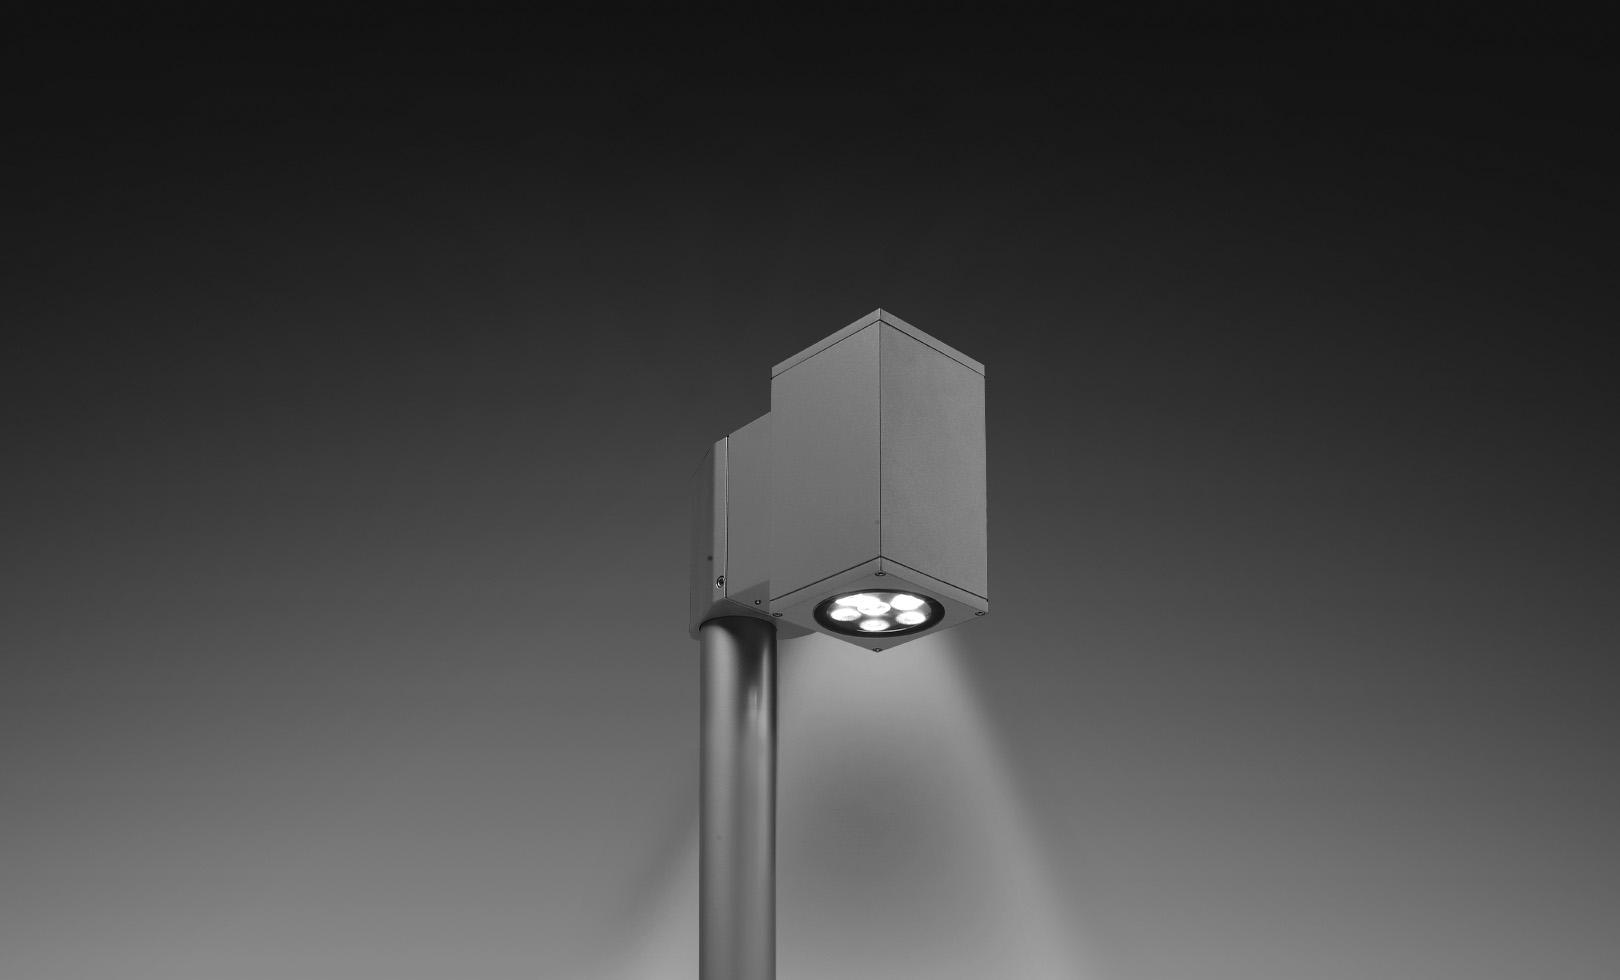 804007 SINGLE TECH POLE-TOP MEDIUM 01 SQUARE PRO LED 1x14W 1